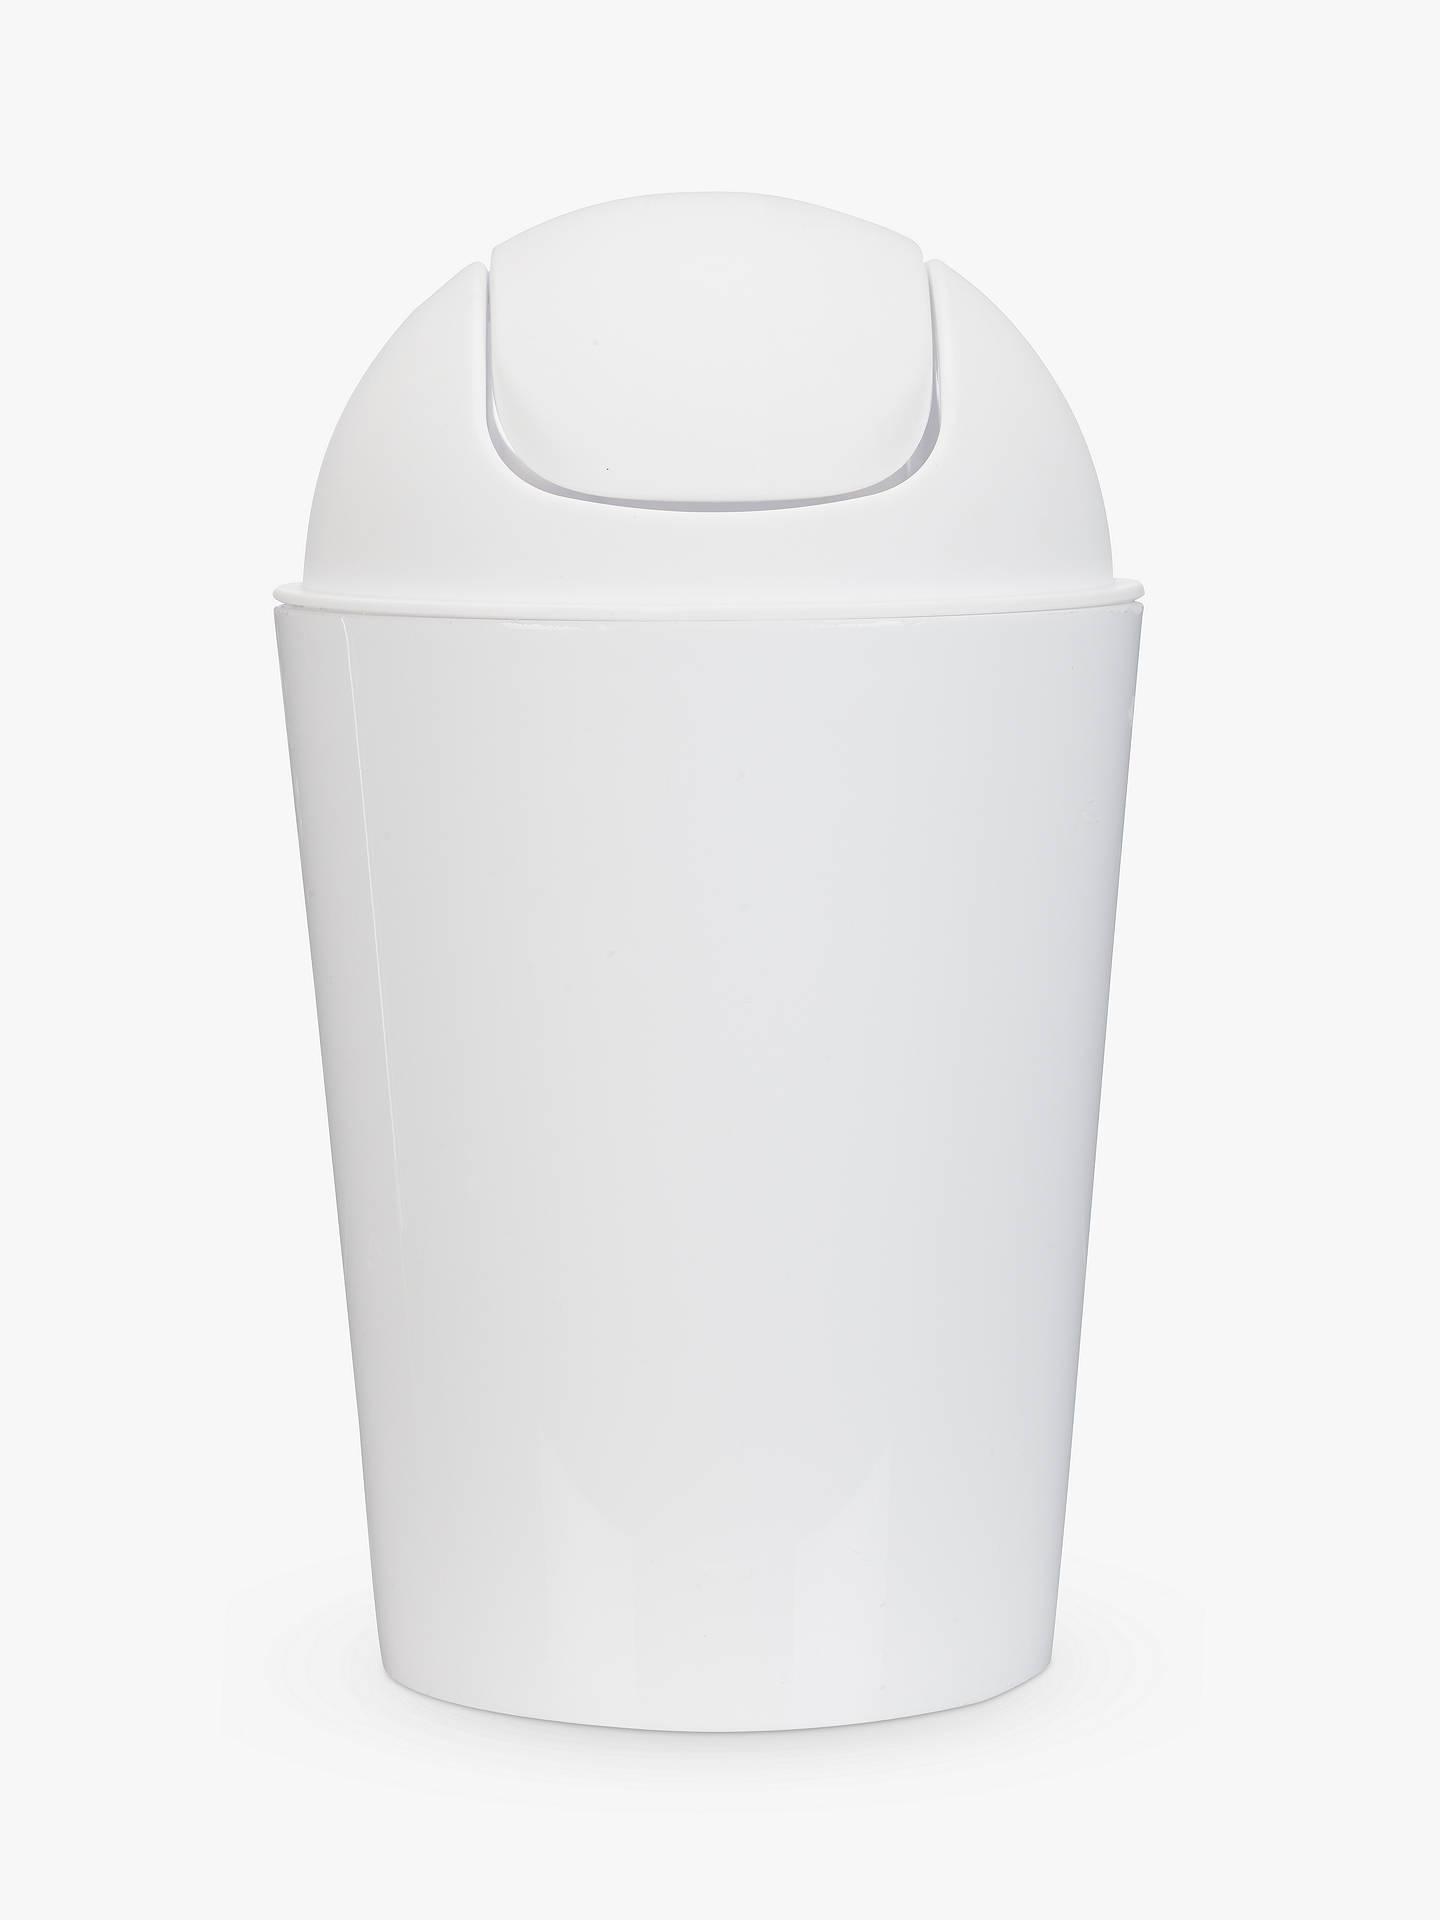 House By John Lewis Bathroom Flip Top Bin White Online At Johnlewis